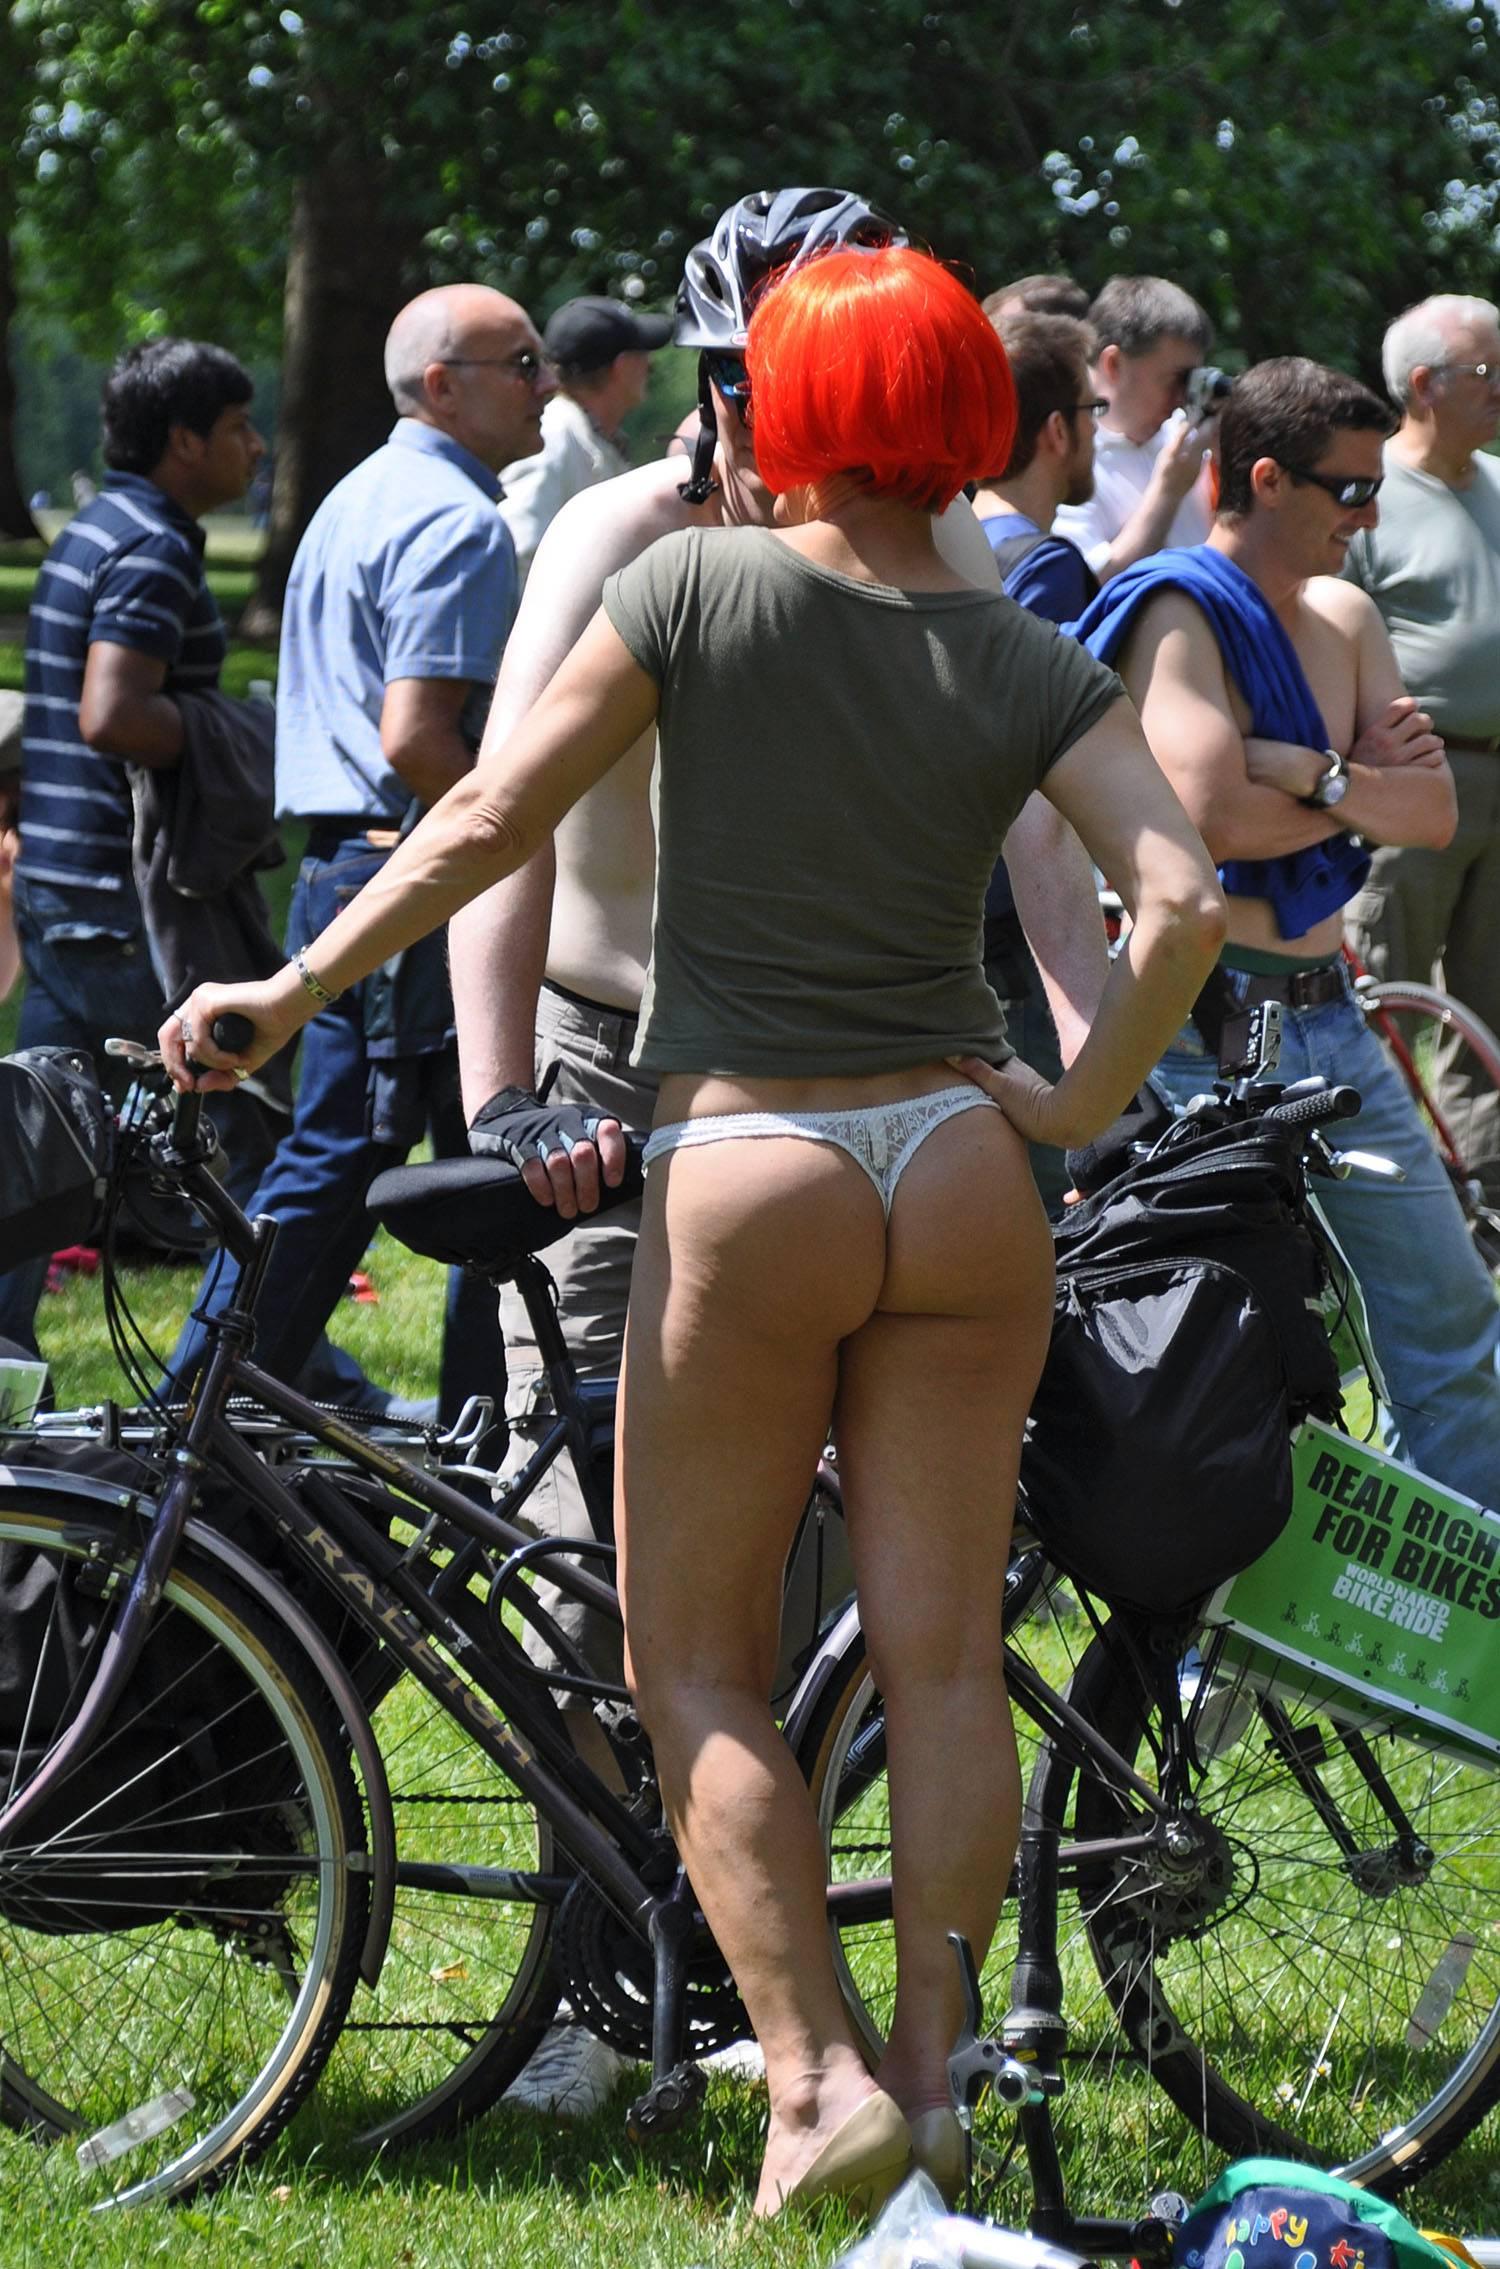 Nudist Photos World Naked Bike Ride (WNBR) 2009 - 1